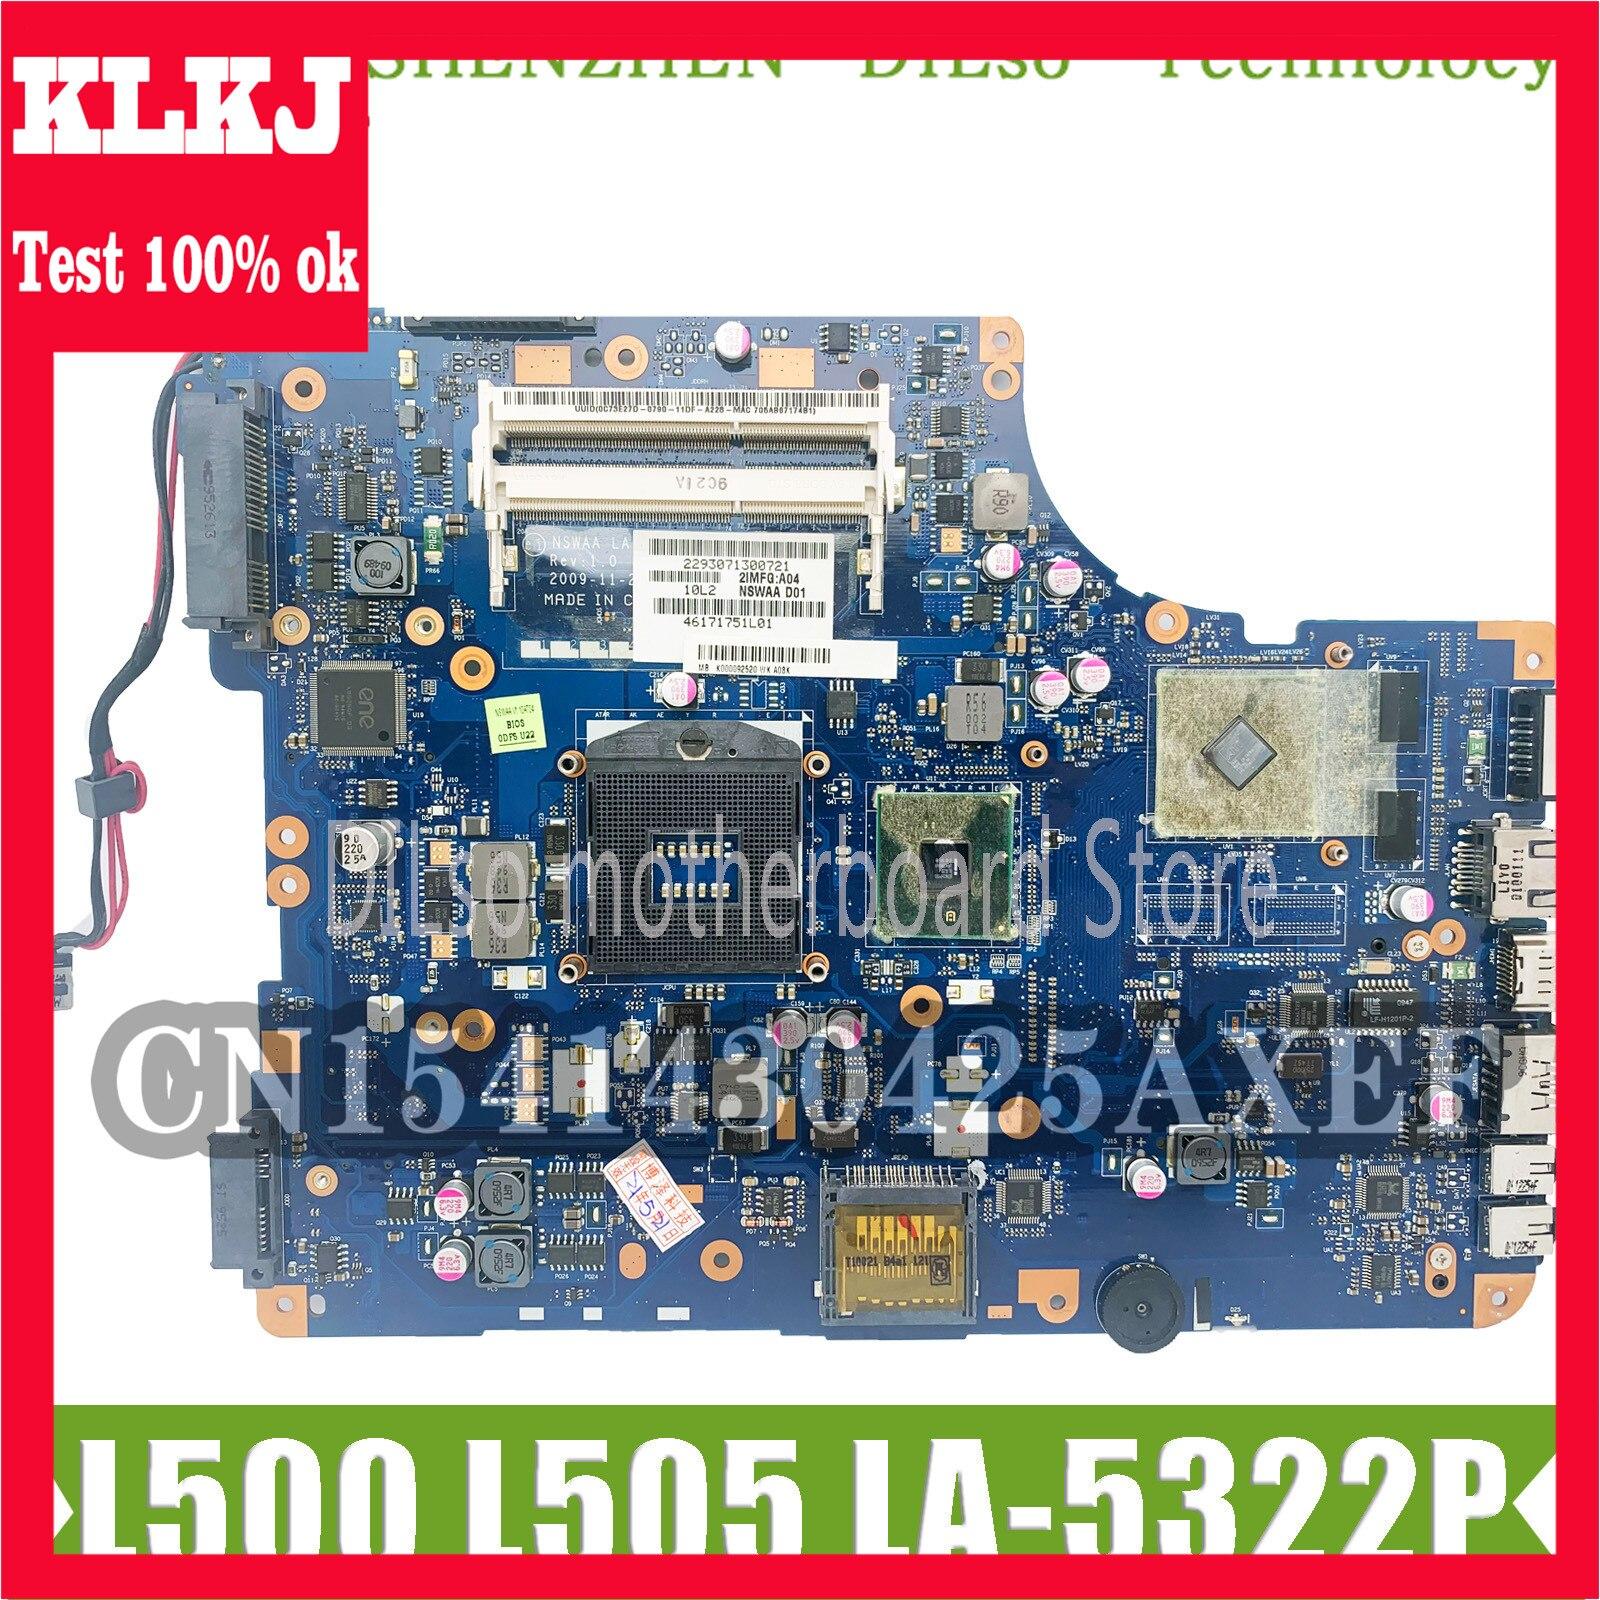 KLKJ LA-5322P اللوحة الرئيسية لتوتوشيبا الأقمار الصناعية L500 L505 اللوحة الأم K000092530 NSWAA LA-5322P HM55 HD4550 الأصلي اختبارها